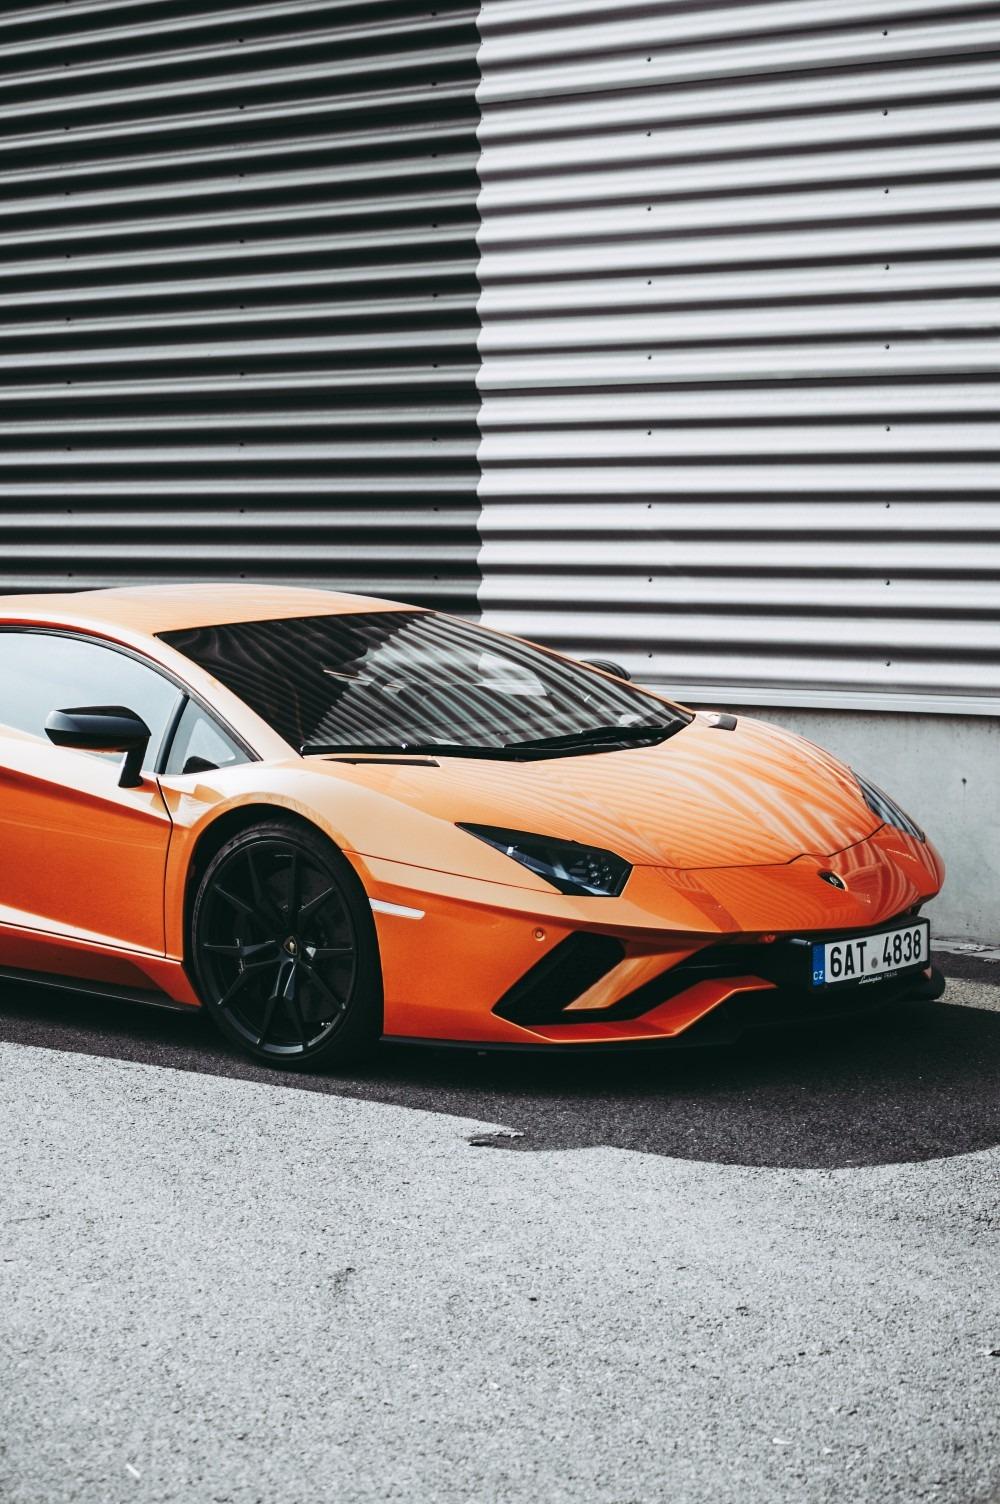 orange Lamborghini Aventador is standing in front of the building.